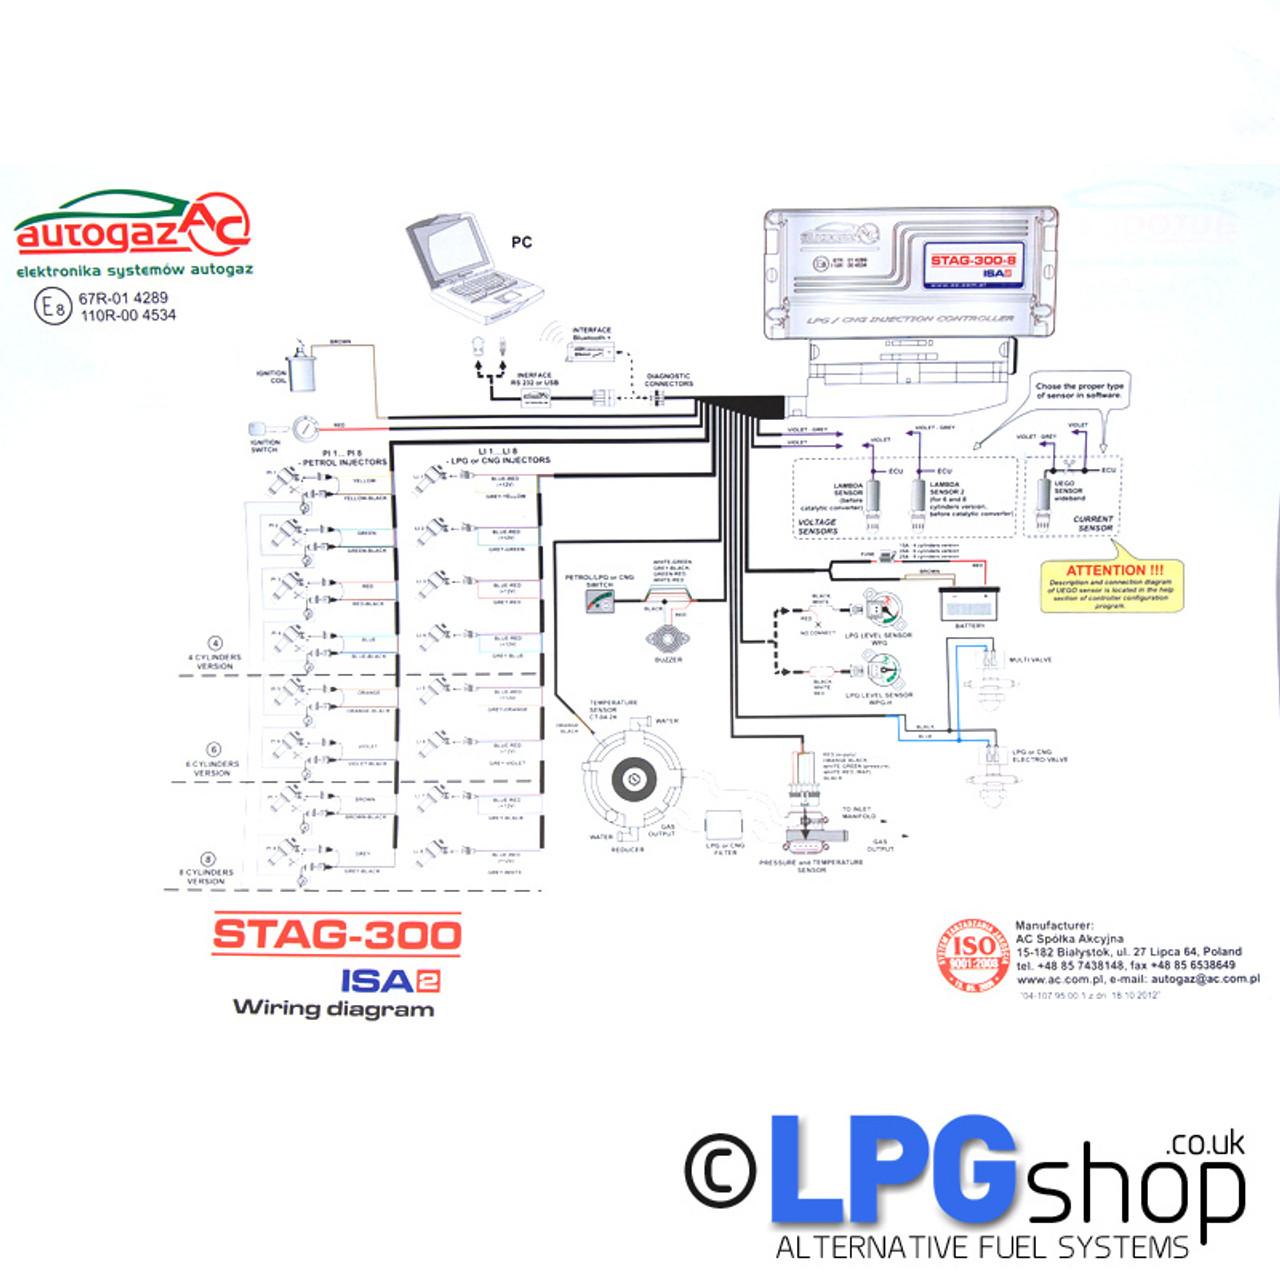 hight resolution of beam propane conversion wiring diagram wiring diagram fascinatingac stag 300 isa2 8 cylinder ecu controller beam